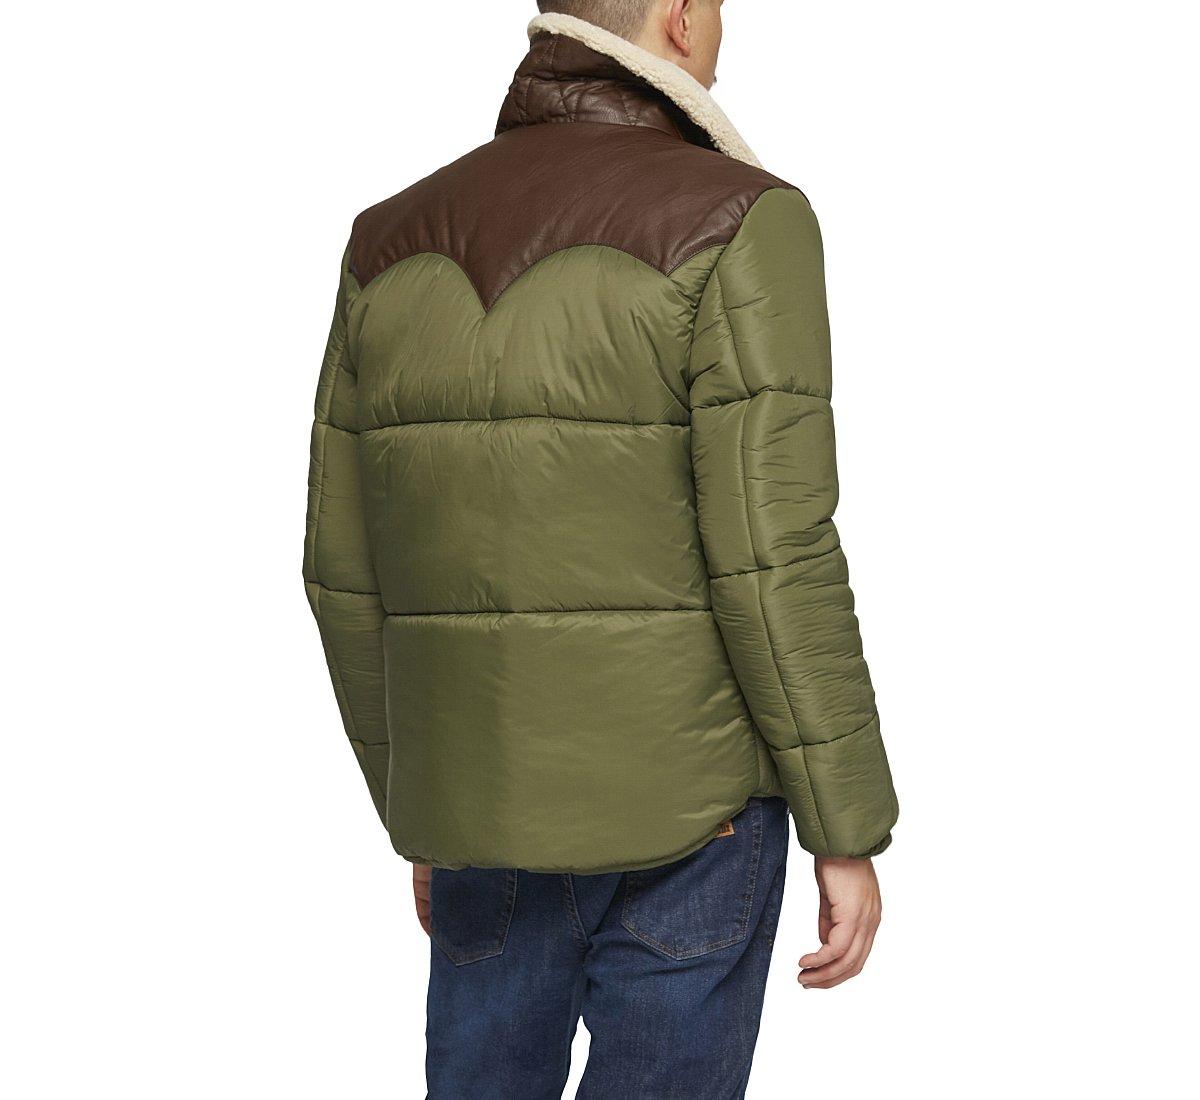 Padded fabric vest